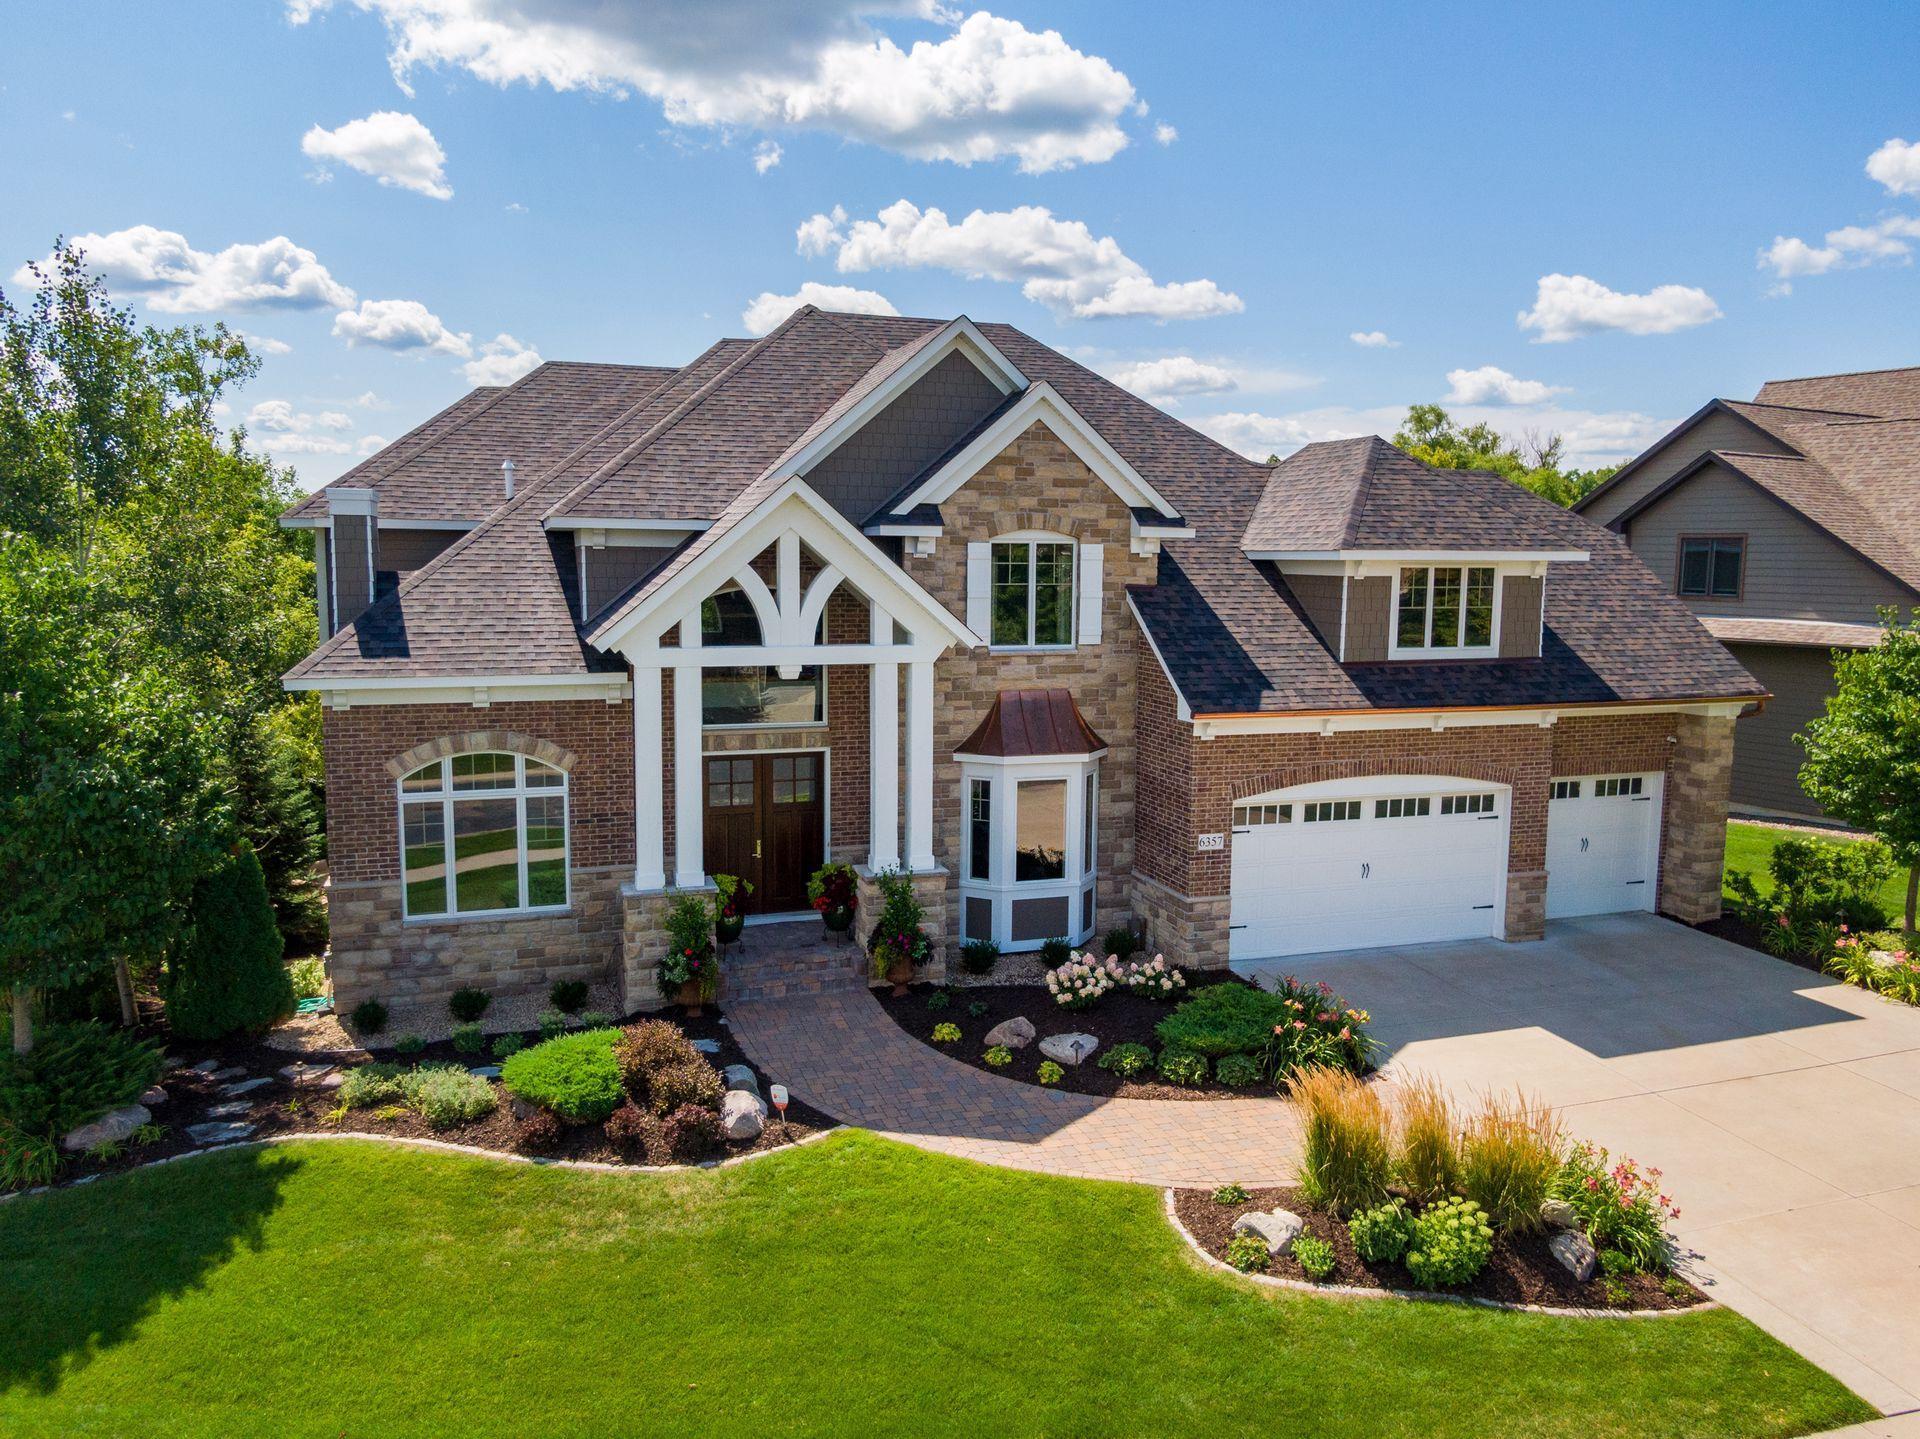 6357 Merrimac Lane N Property Photo - Maple Grove, MN real estate listing